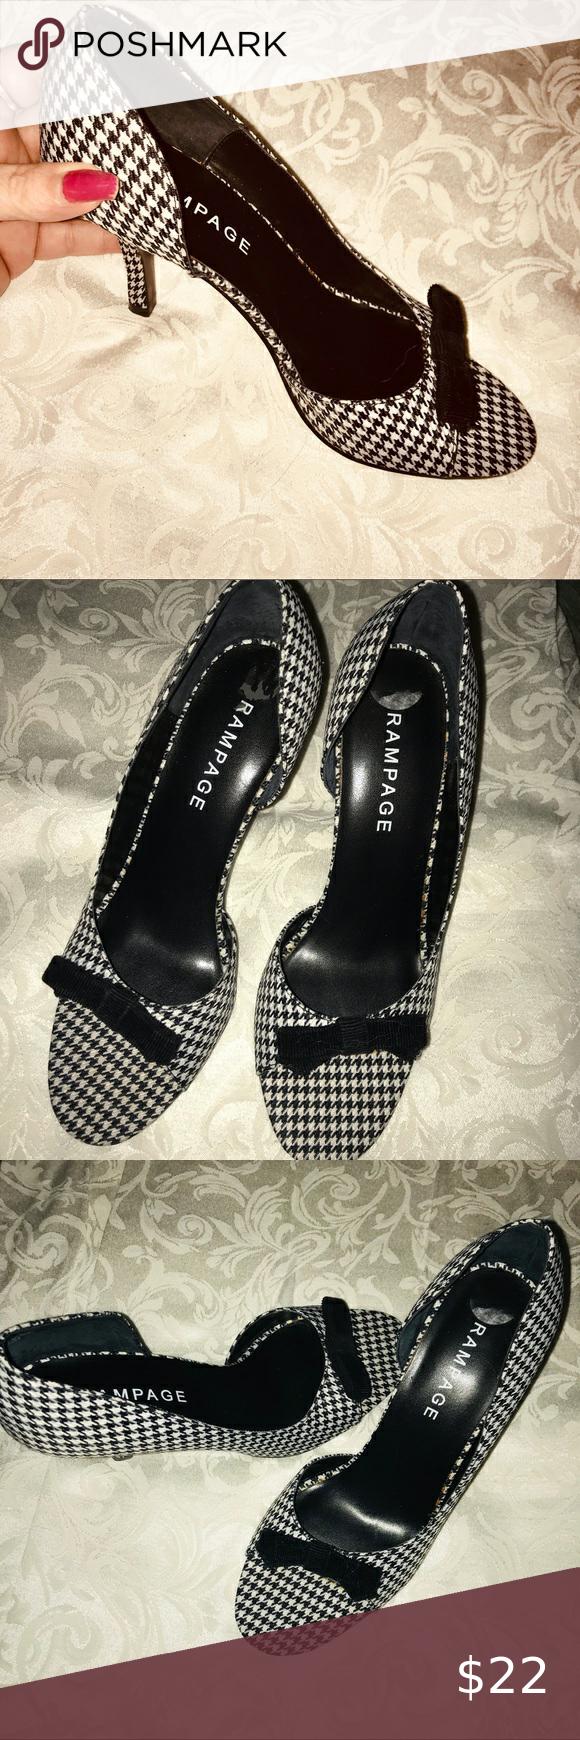 Rampage Black checkered High Heels. New Rampage Bl